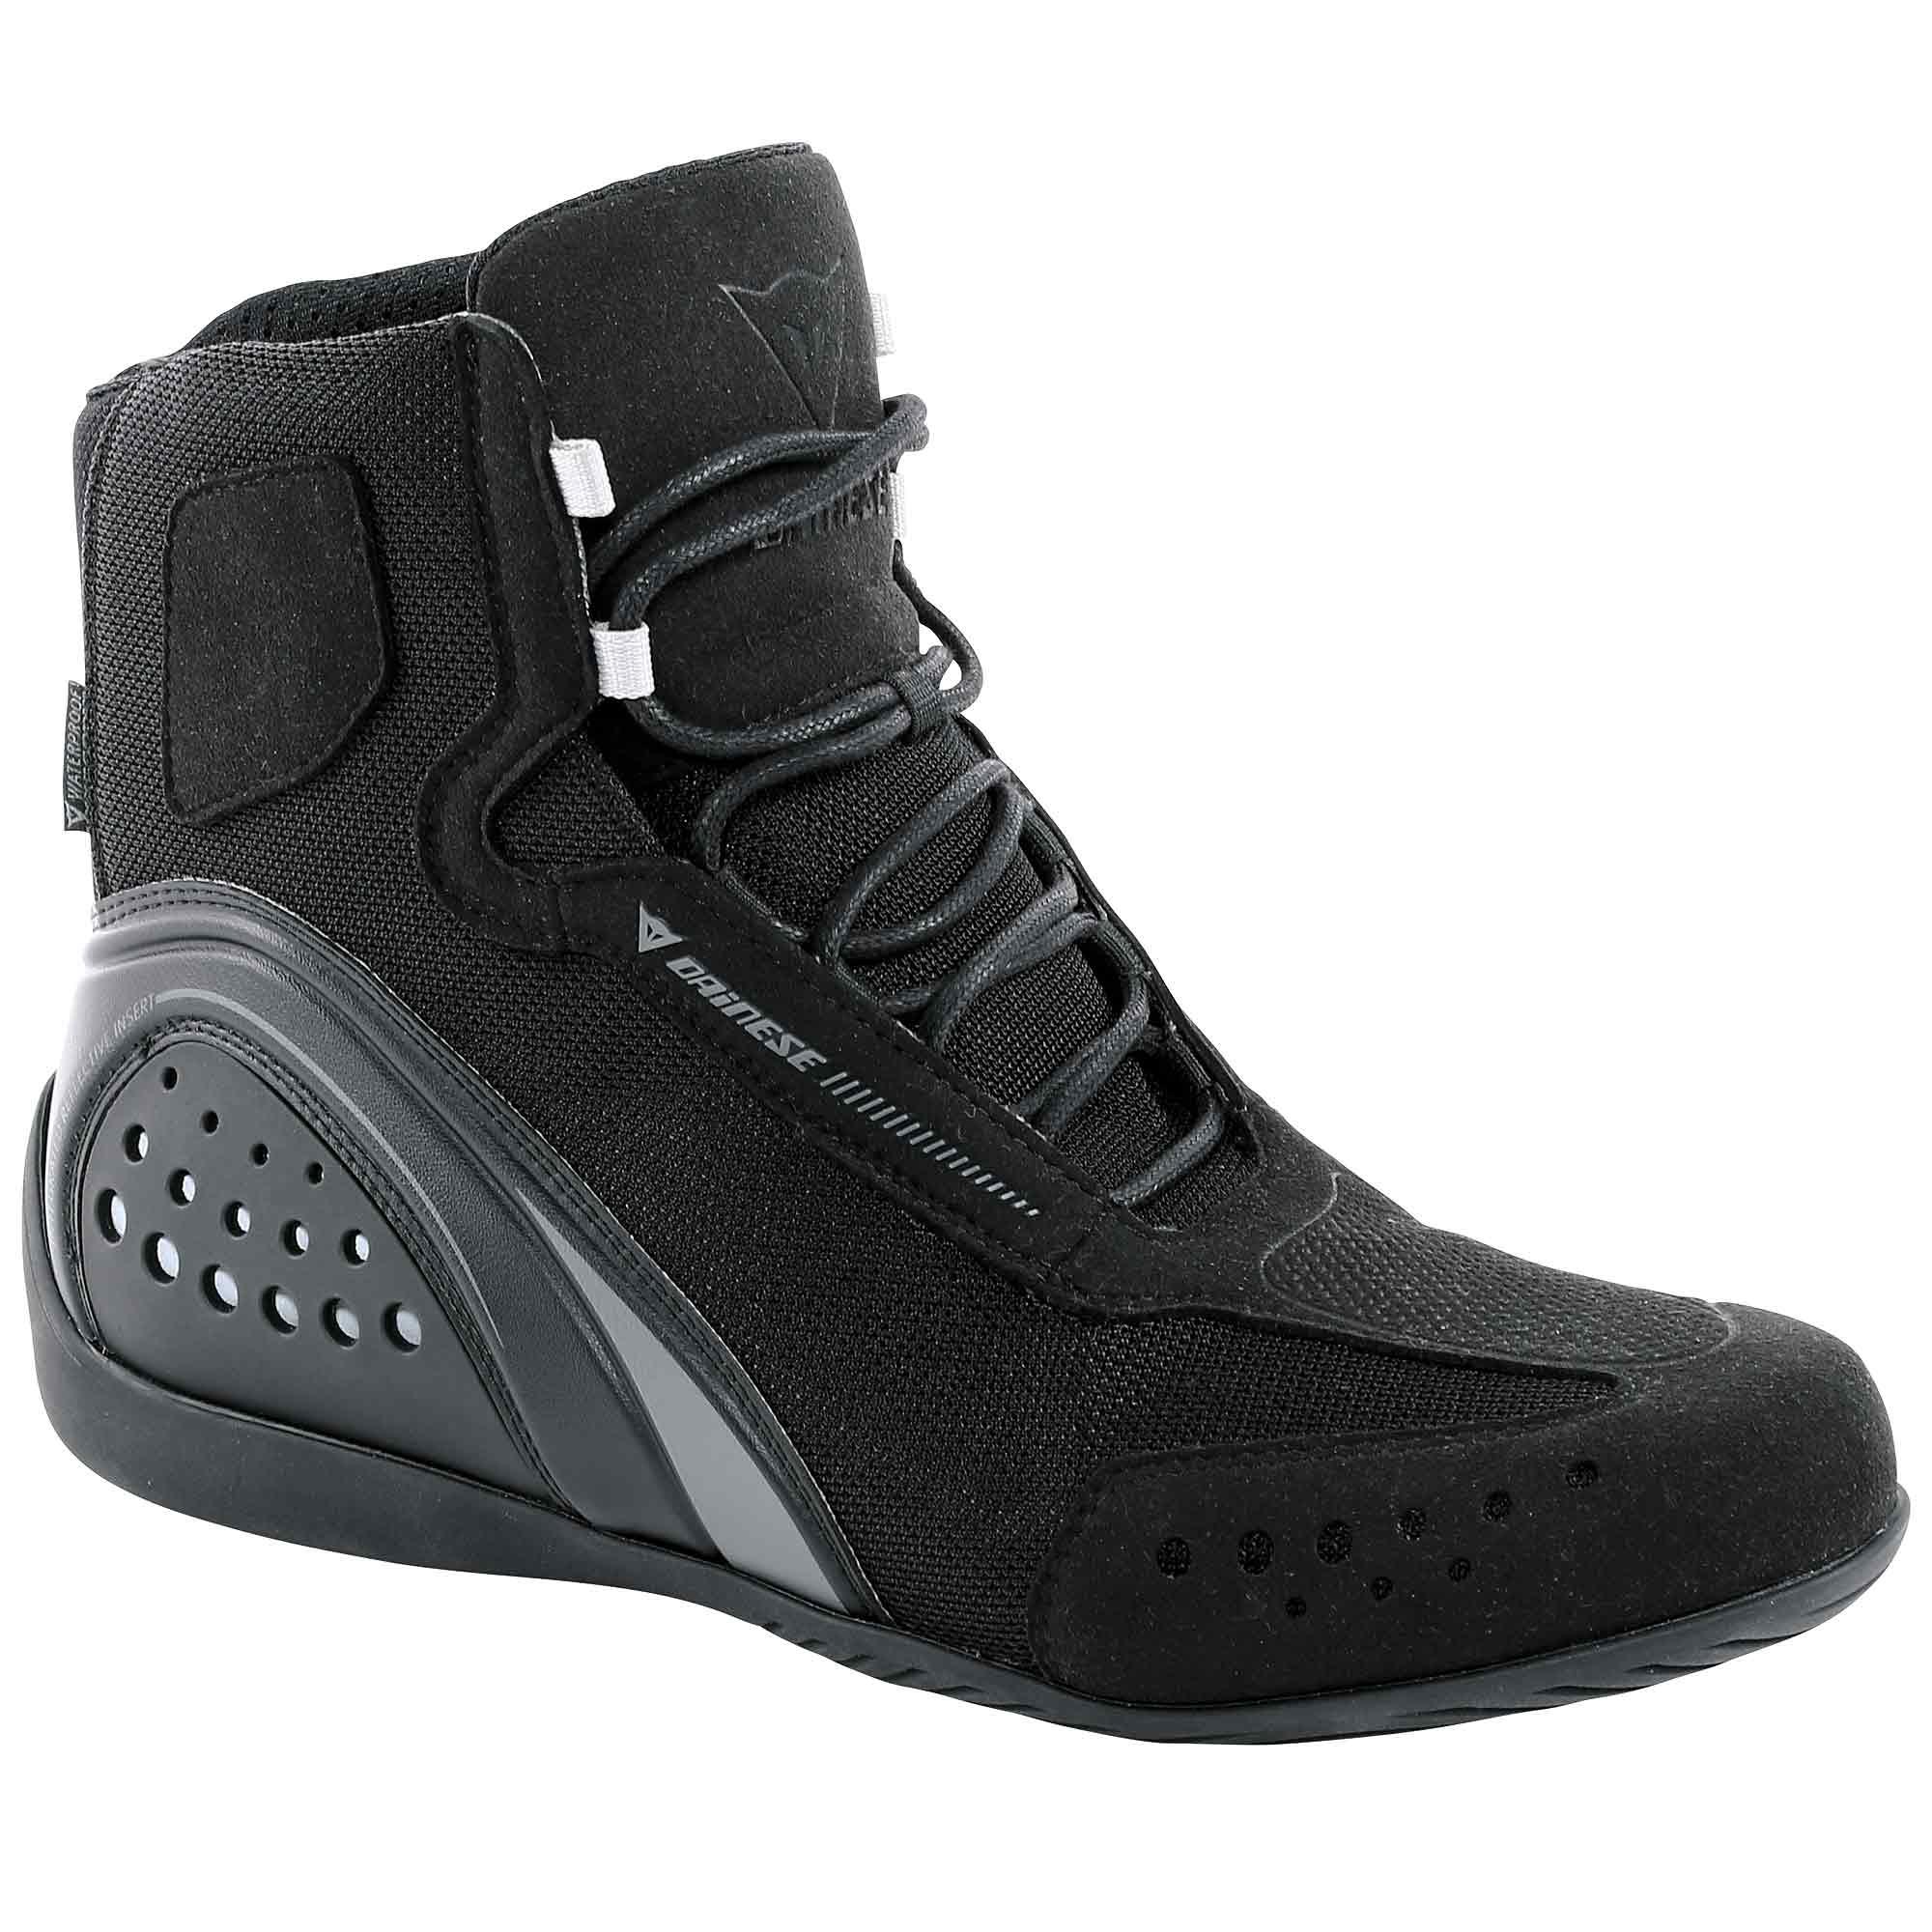 chaussure dainese femme,baskets dainese motorshoe lady d wp